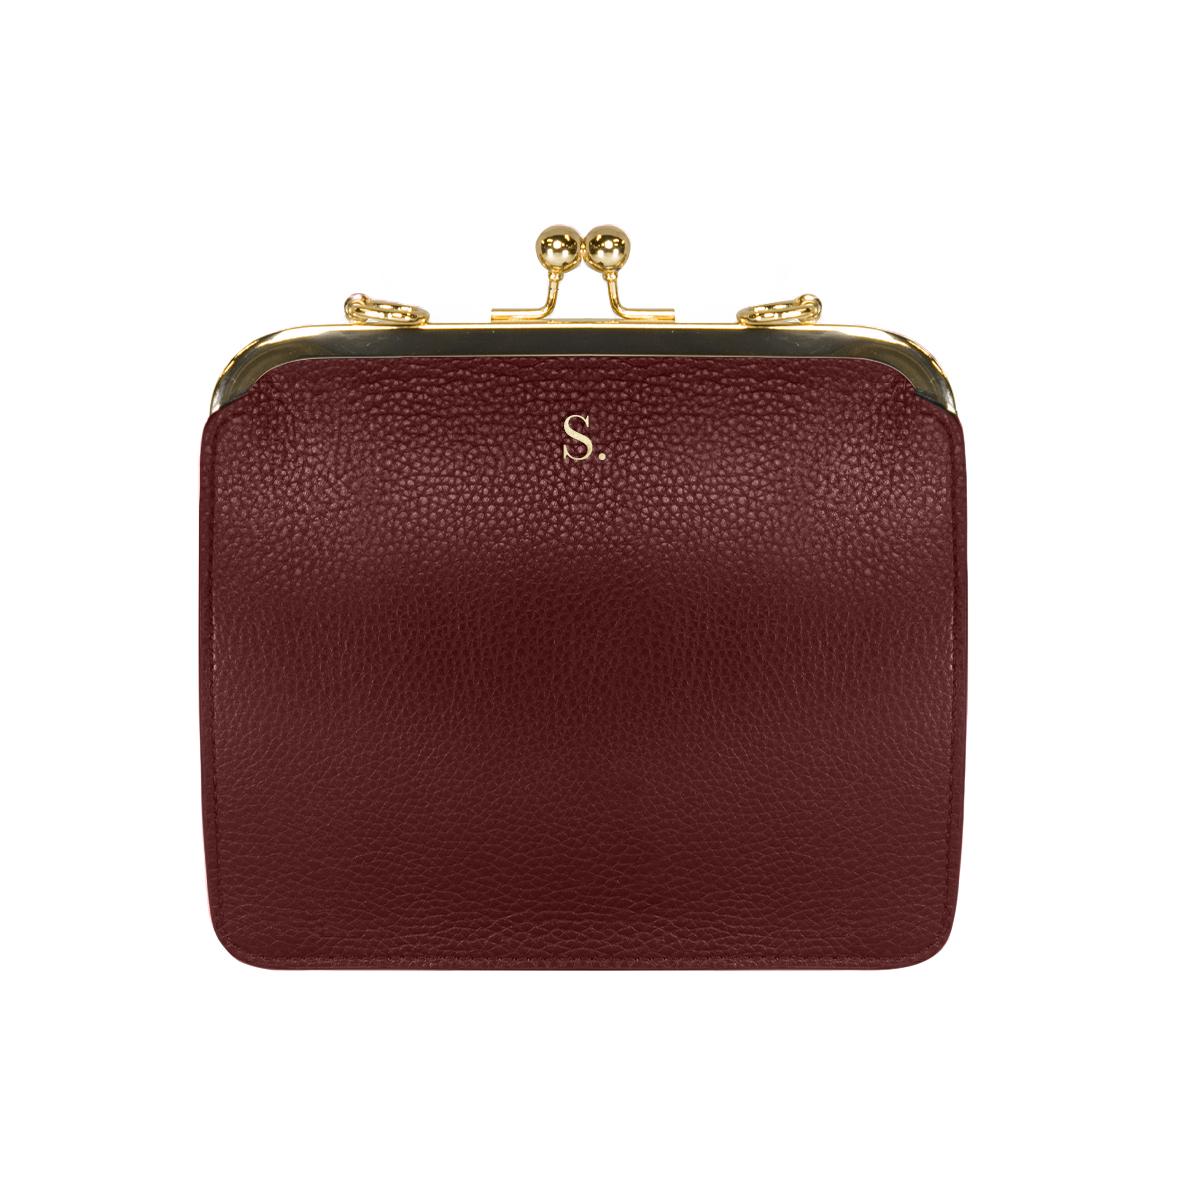 Grainy Burgundy Lola Bag (Gold Metal Detail)